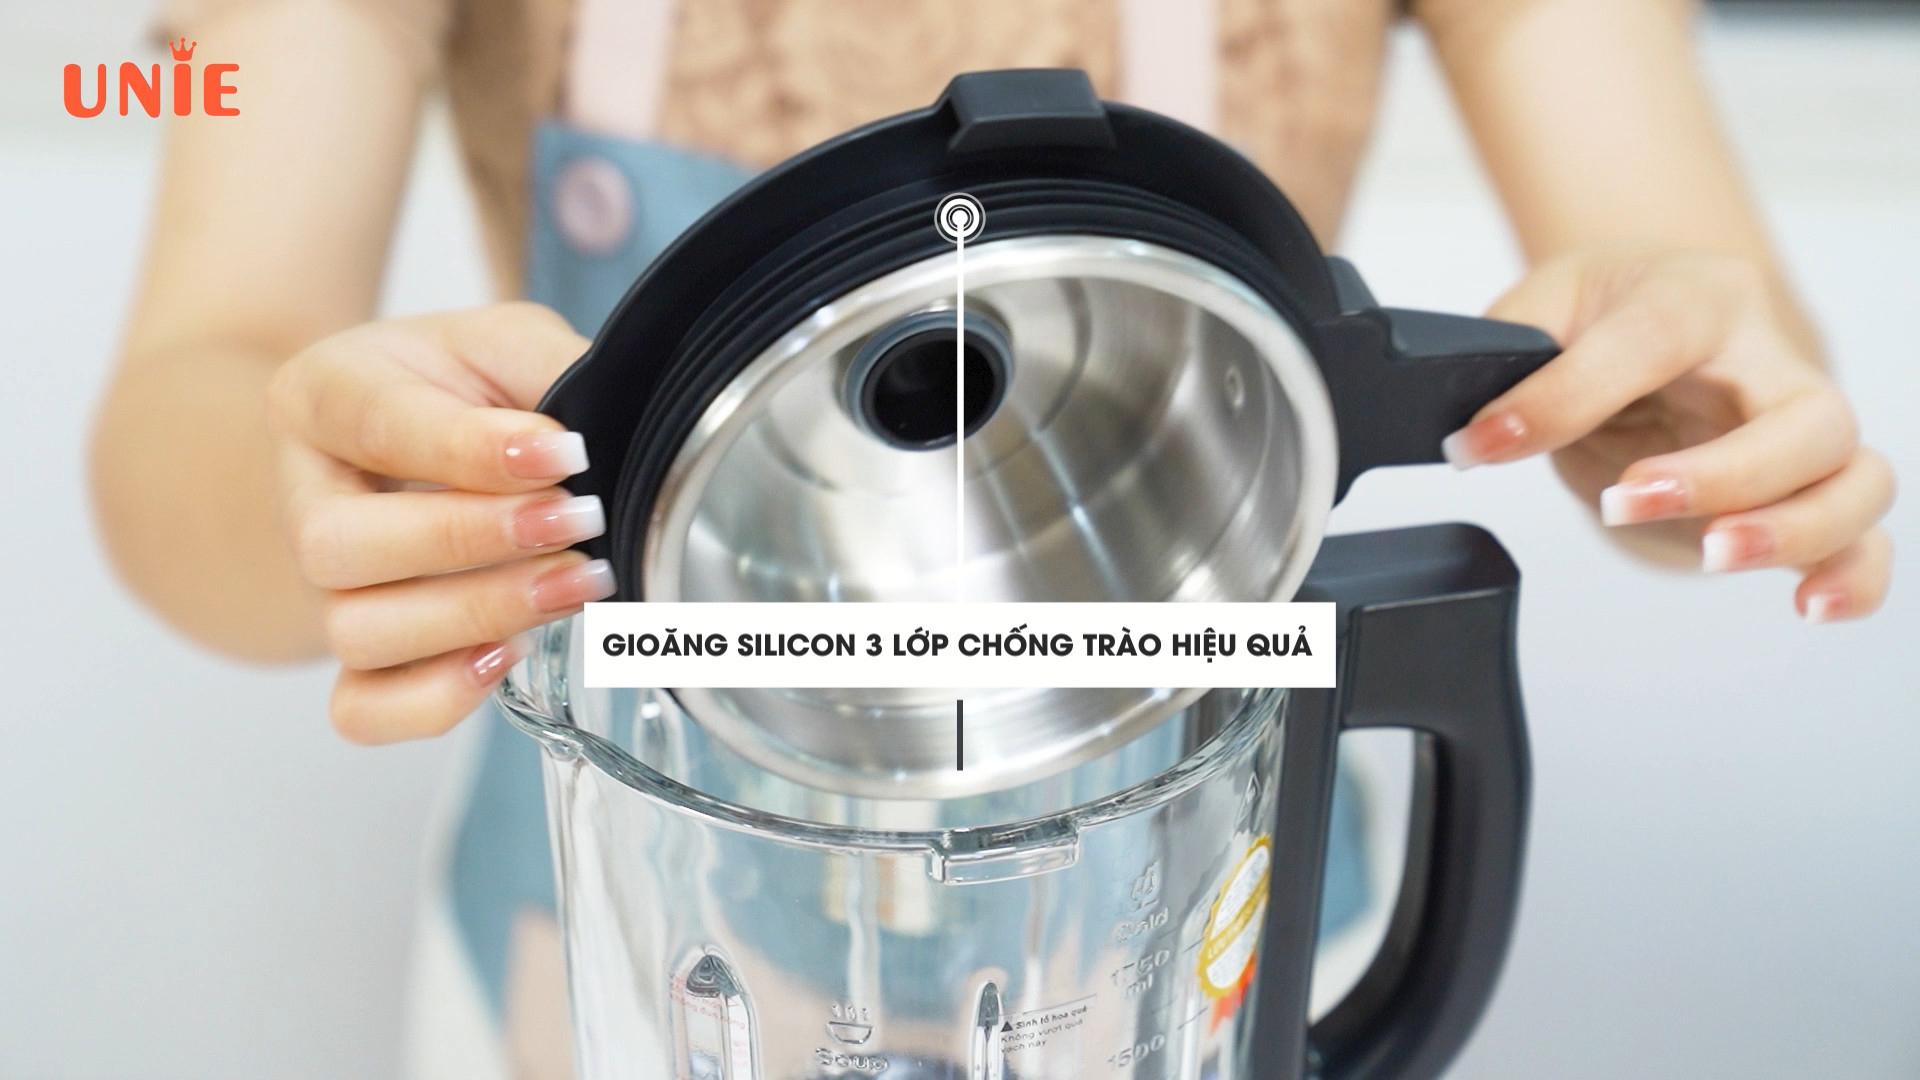 may-nau-sua-hat-unie-v6s-nap-chong-trao